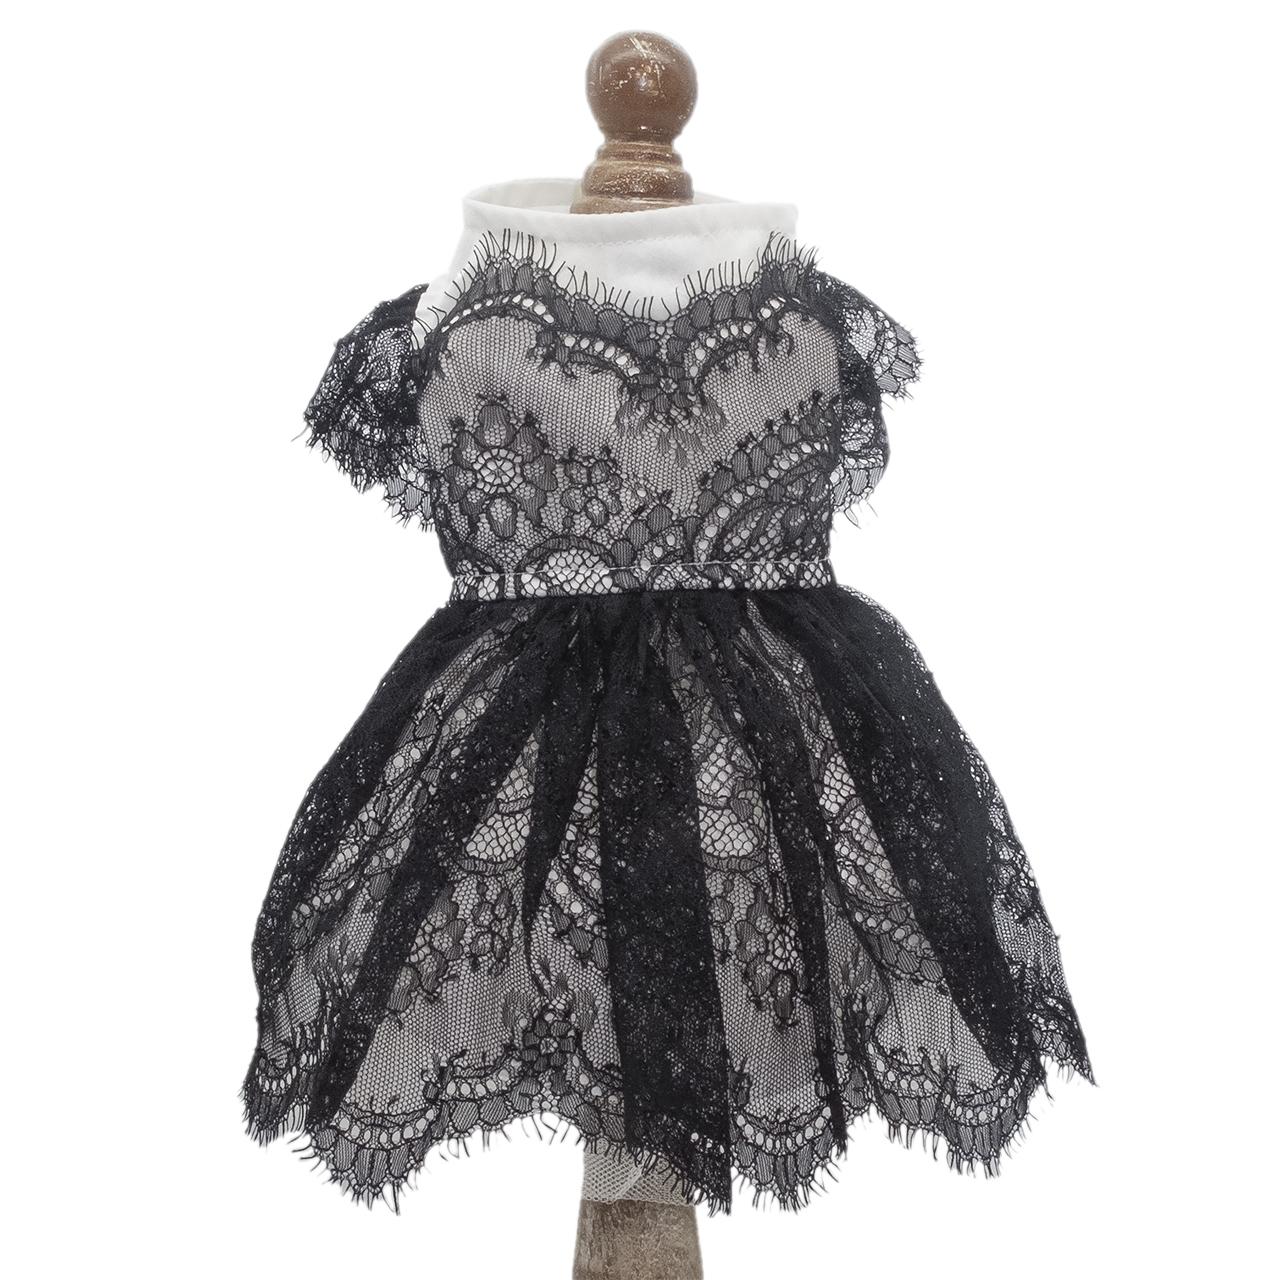 ELENT ブラックレーススカラップドレス